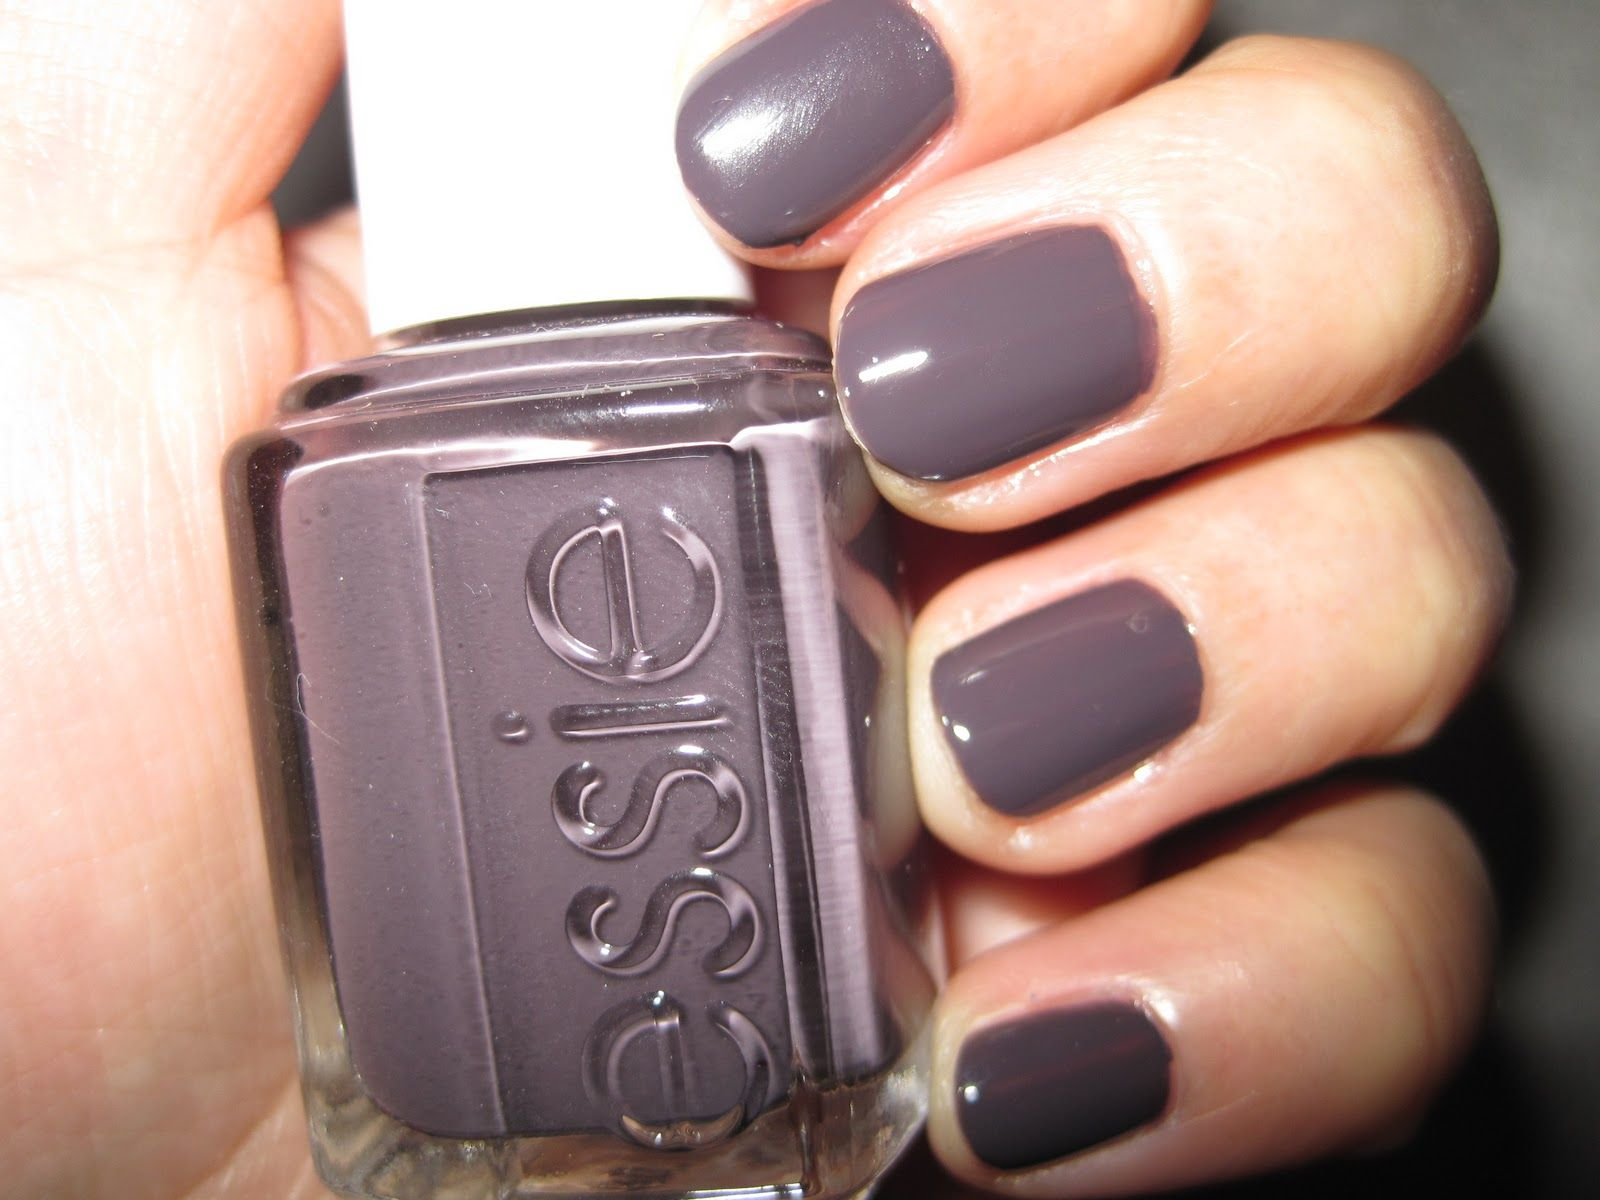 essie nail polish color smokin hot | s t y l e : n a i l s ...